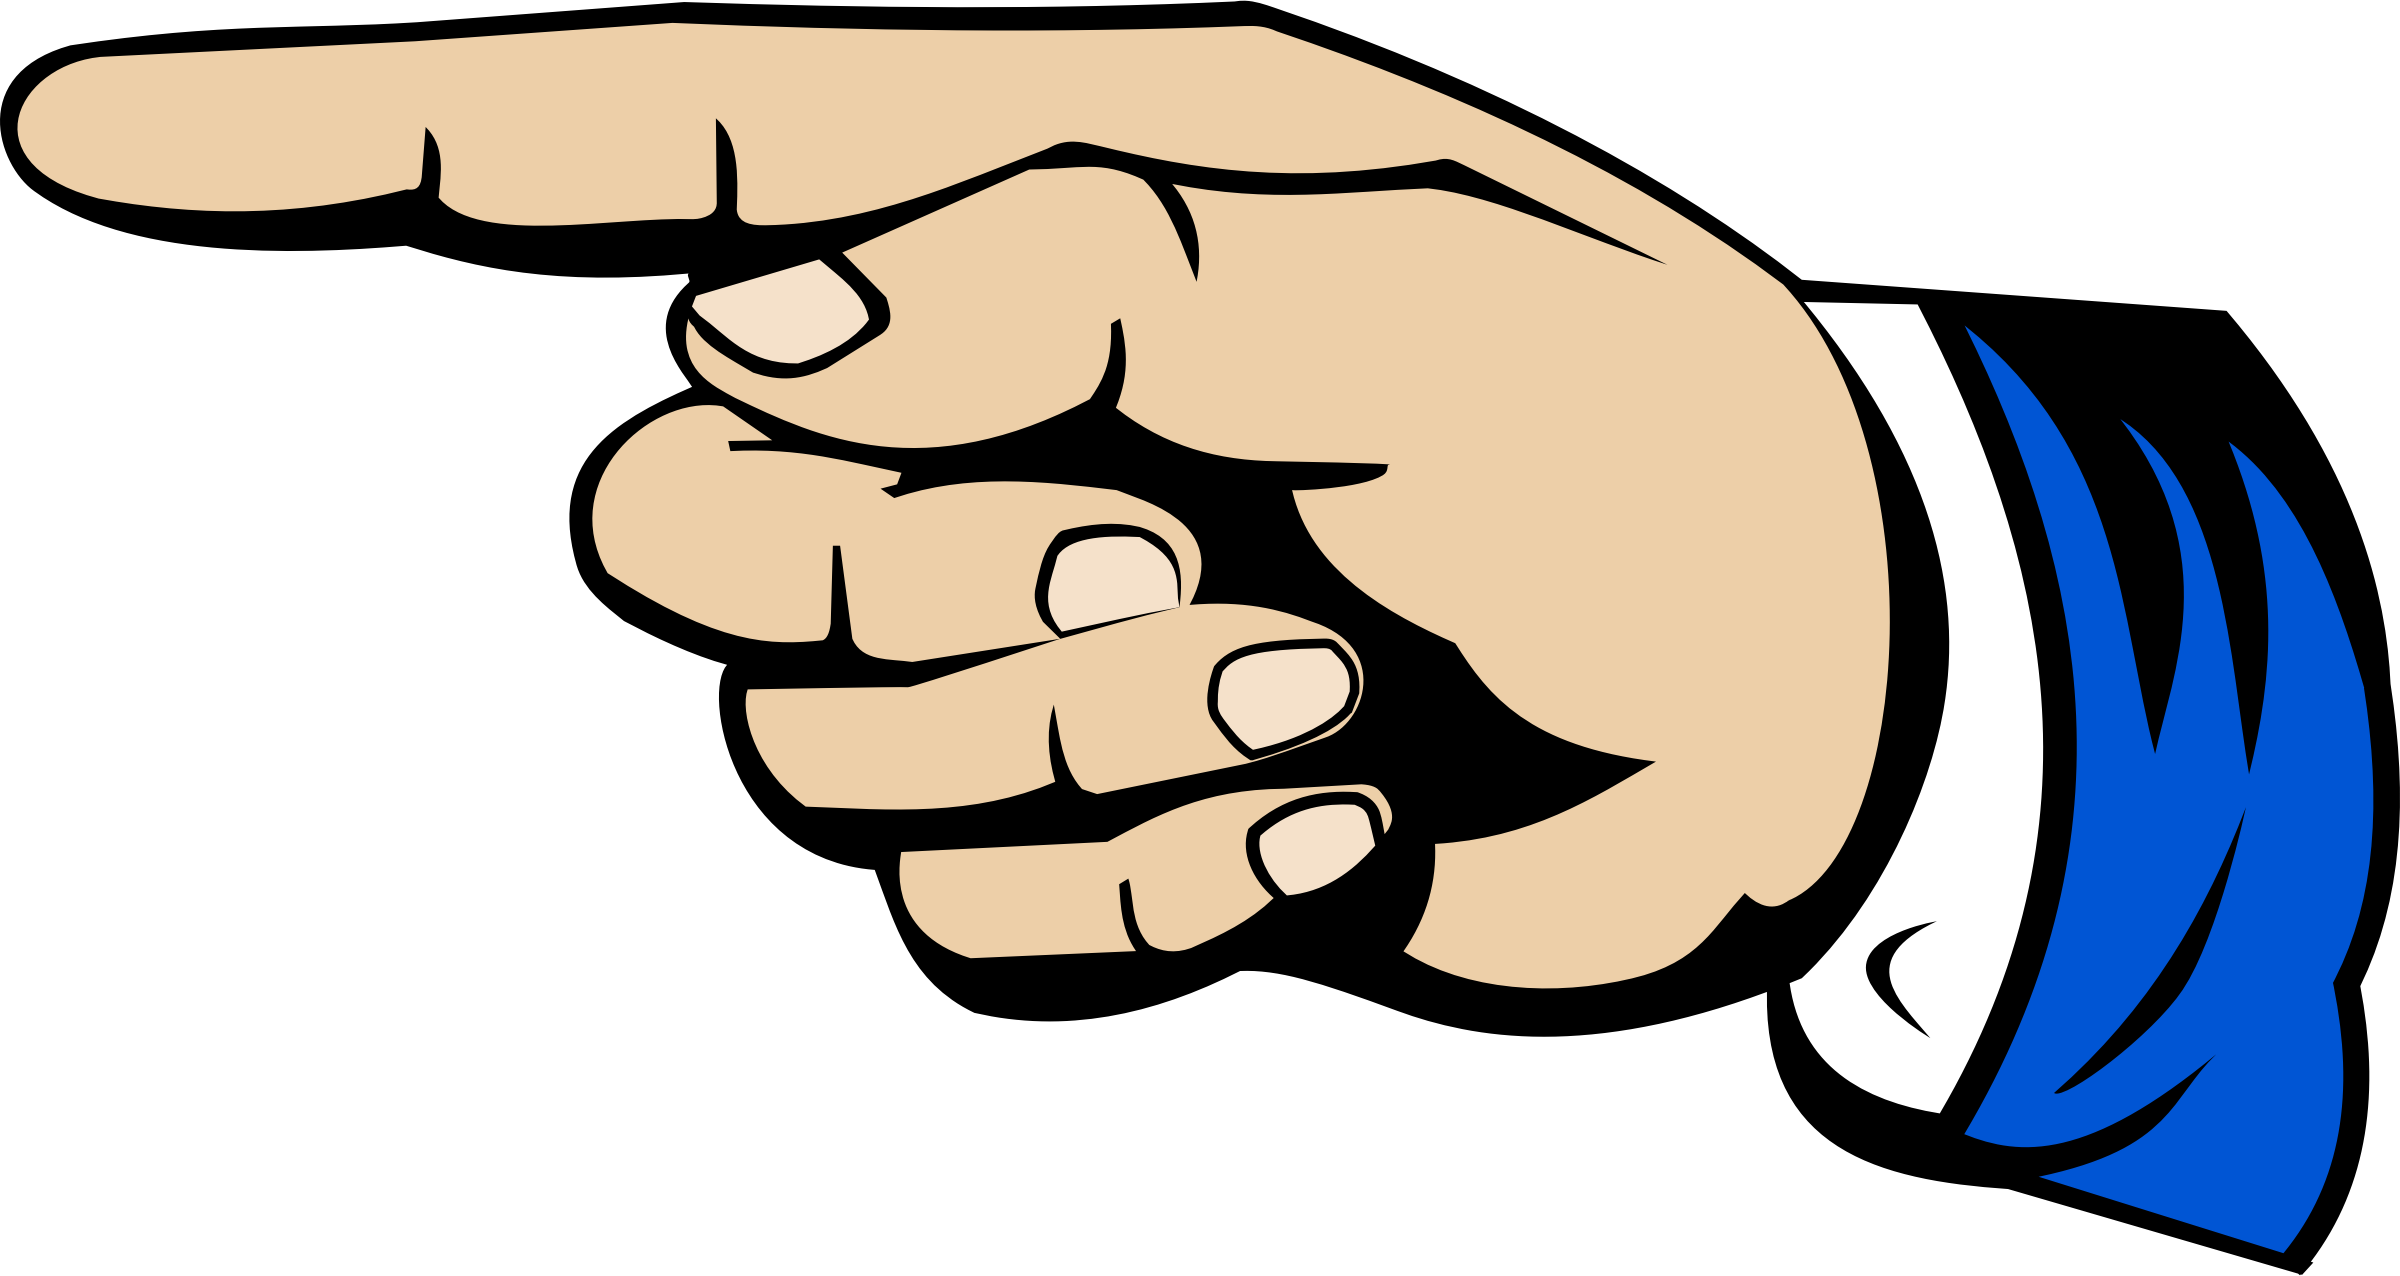 graphic transparent stock Thumb clipart. Index finger digit clip.